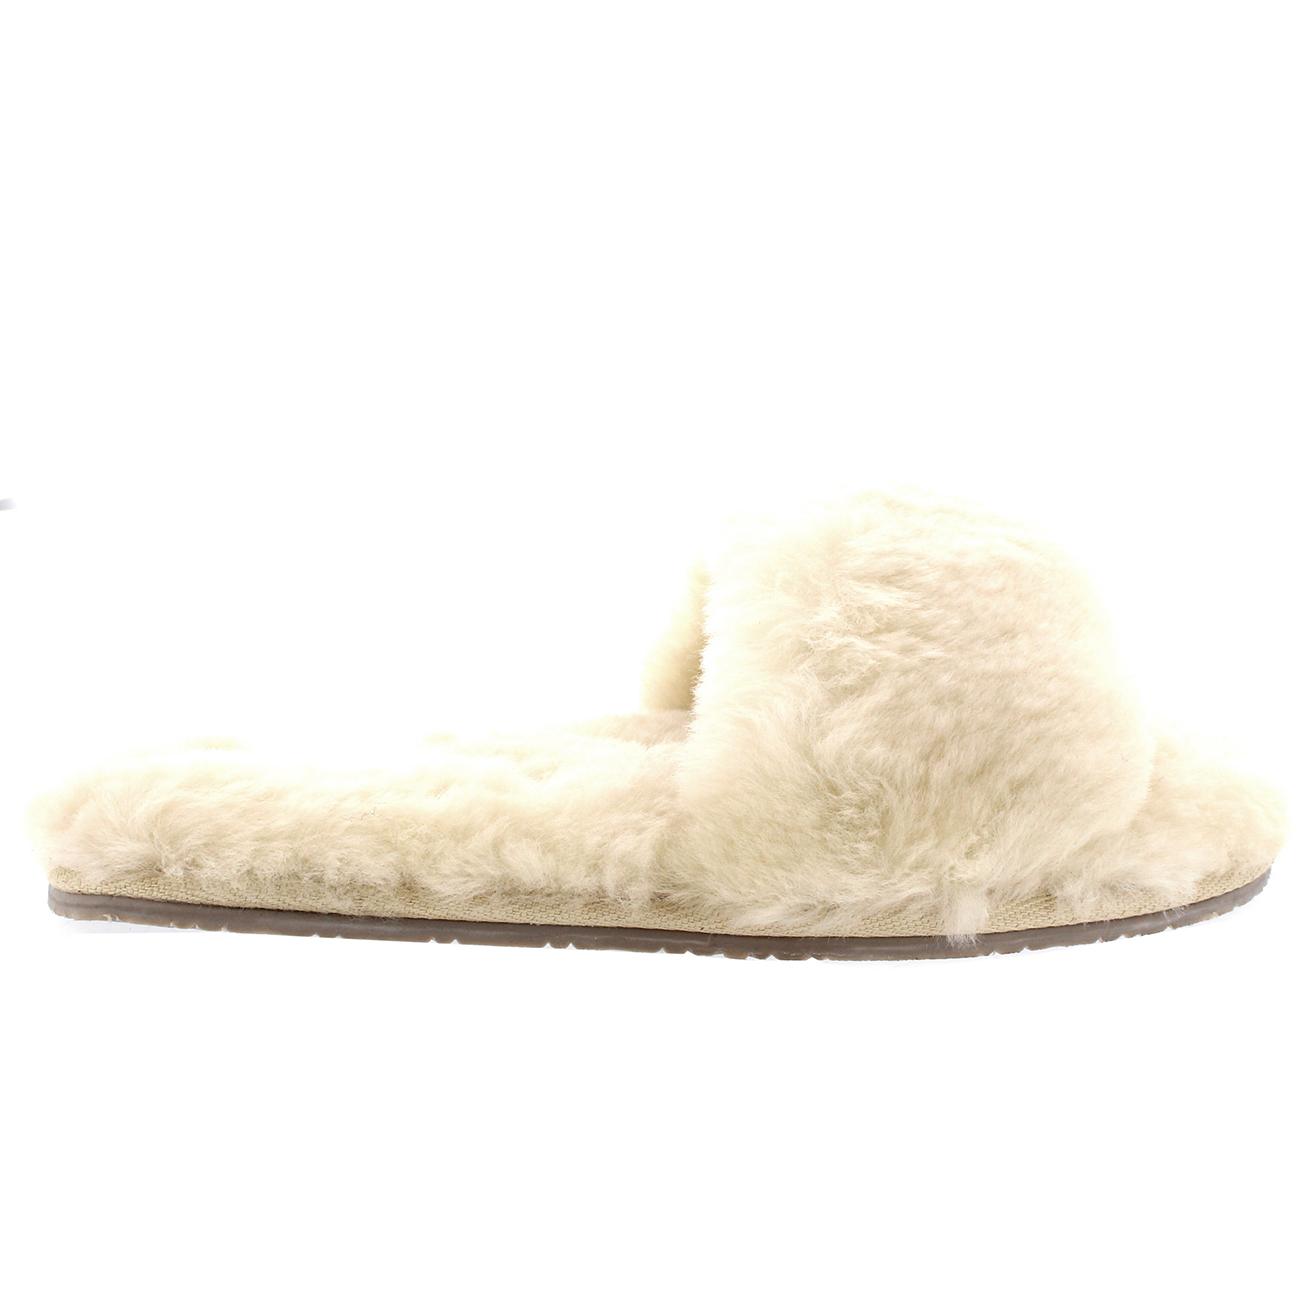 Ladies Real Australian Sheepskin Sandal Winter Open Toe Fur Slippers All Sizes